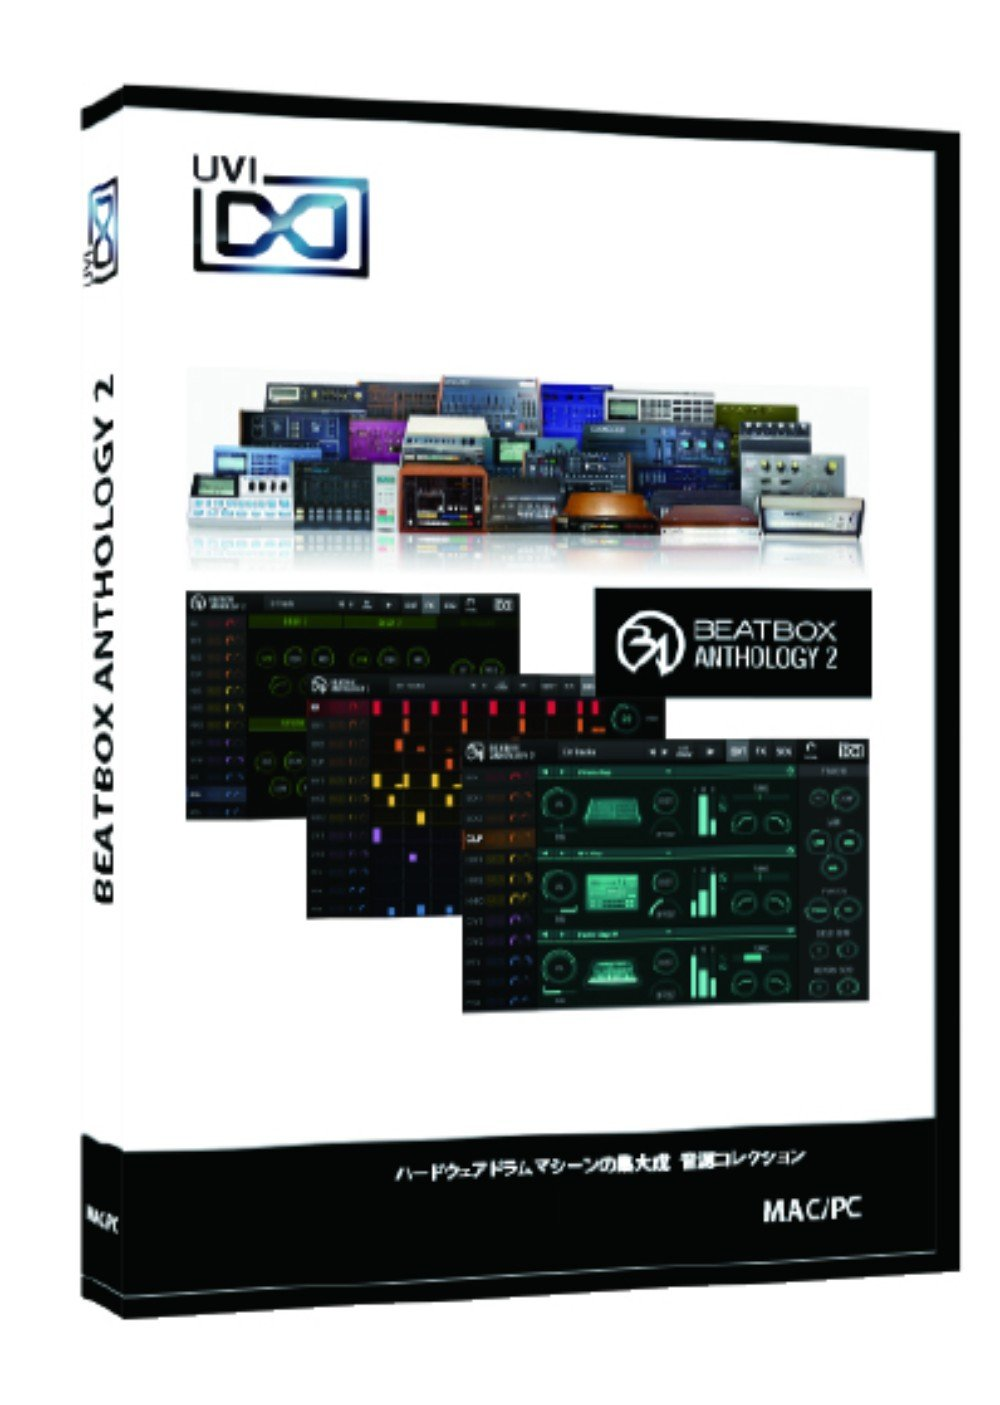 UVI Beat Box Anthology 2 ドラムマシーン音源コレクション【ダウンロード製品/国内正規品】B077QGZ4RD